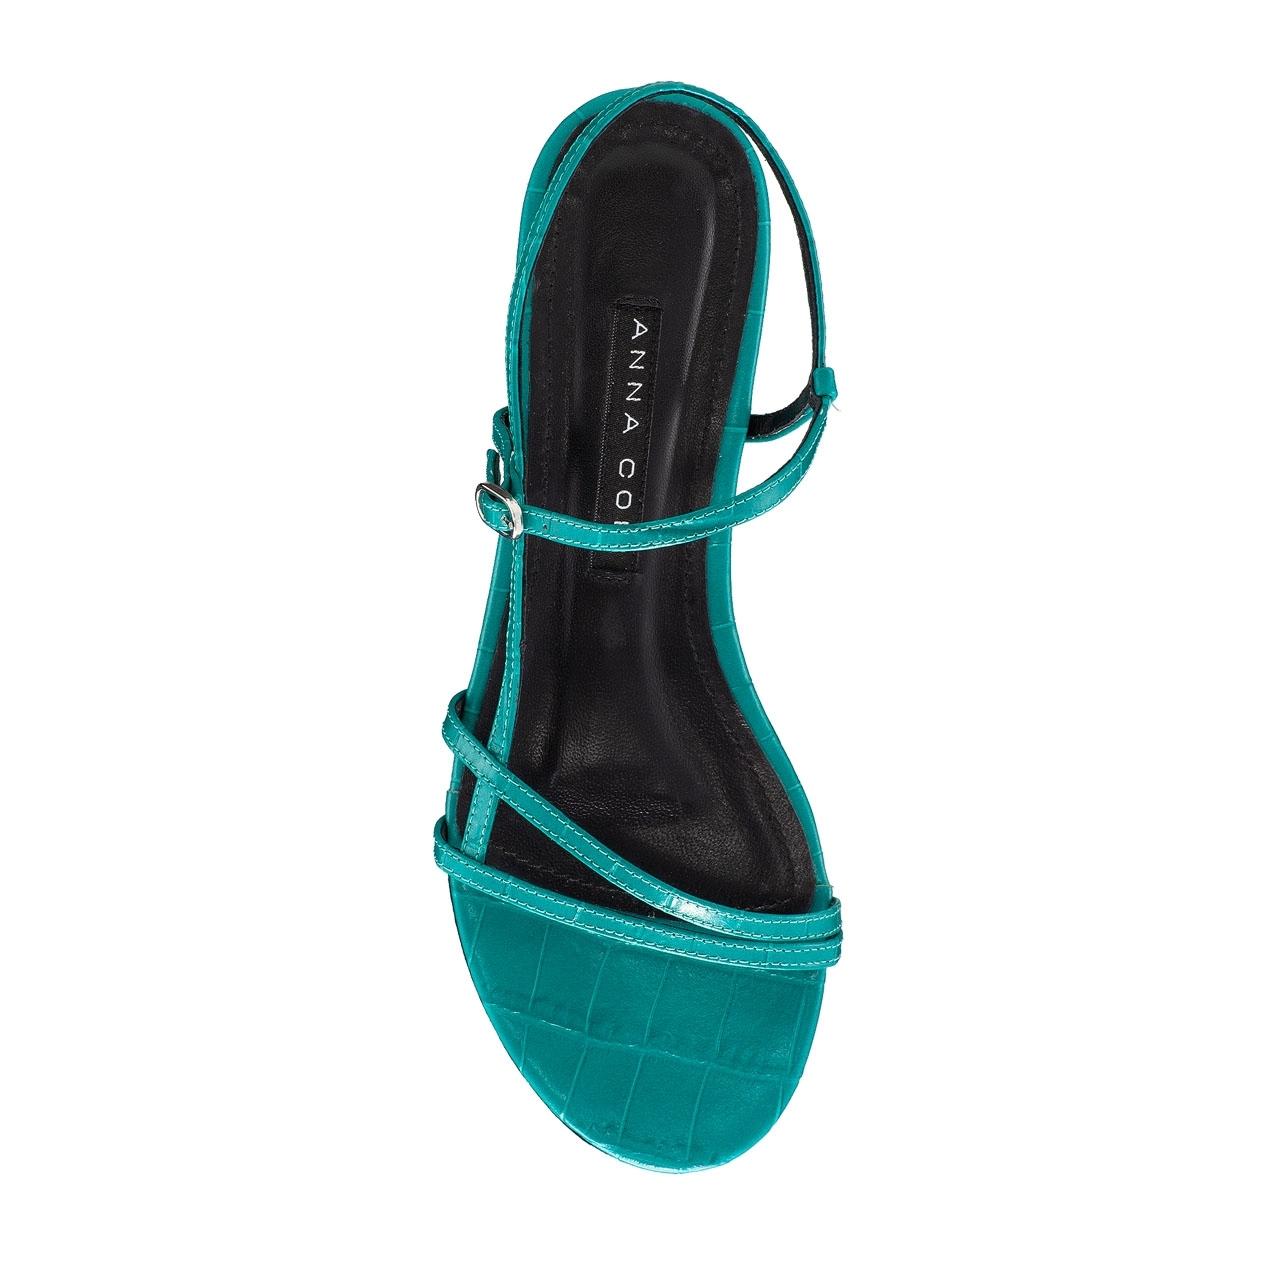 Imagine Sandale Dama 5850 Croco Turchese